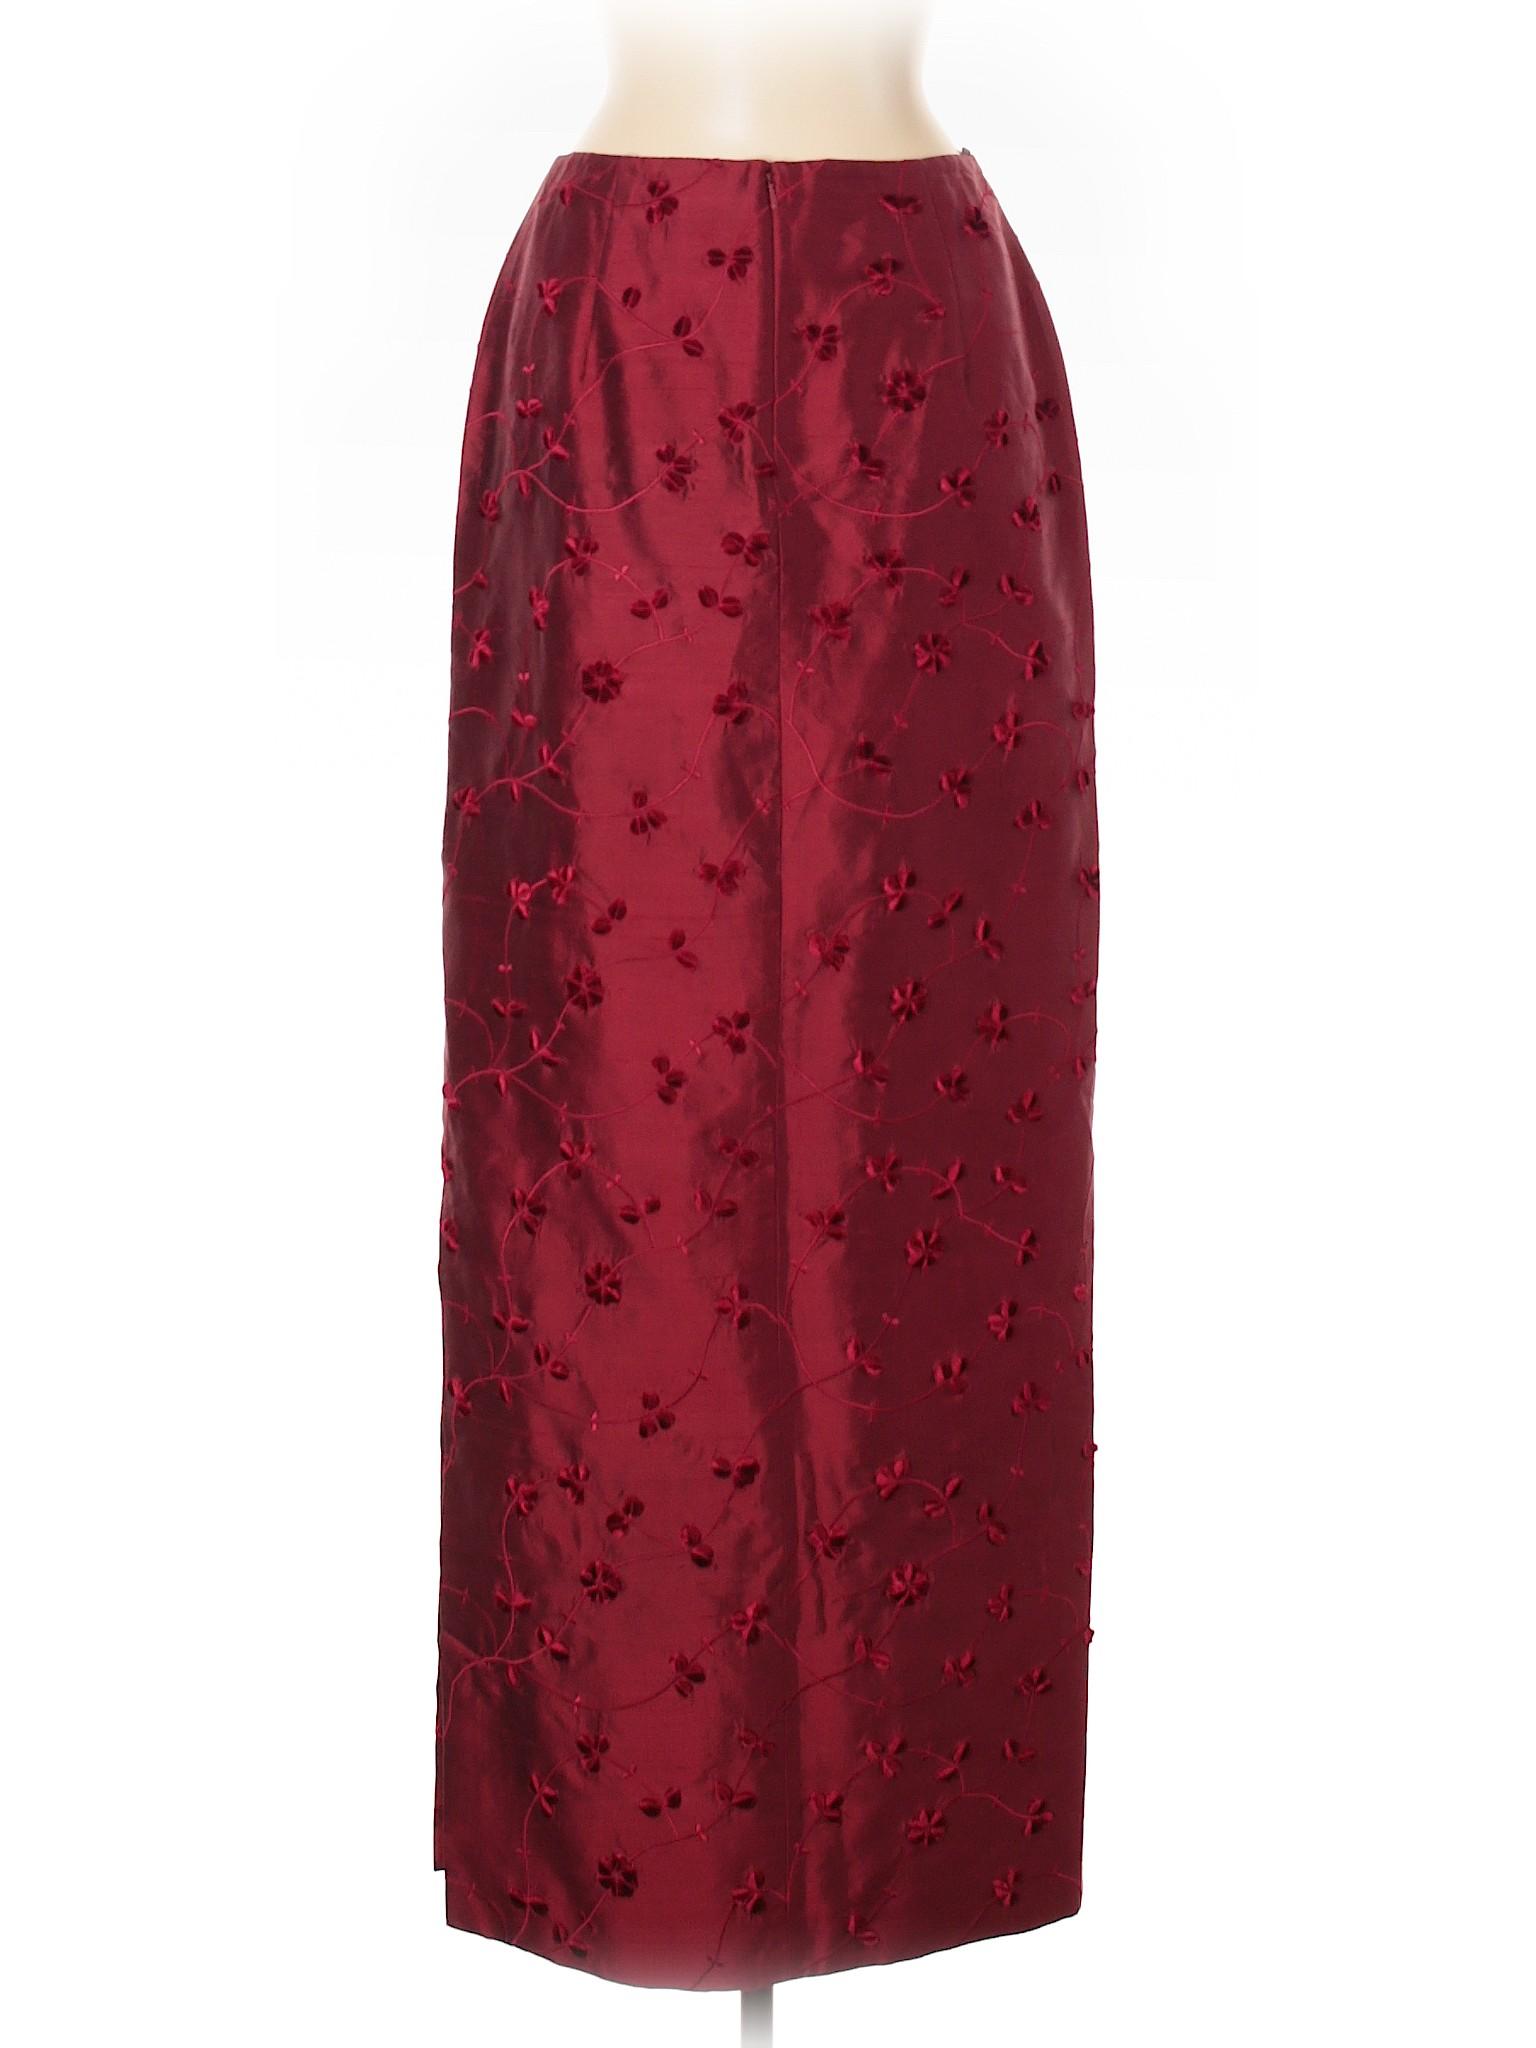 Boutique Skirt Skirt Silk Skirt Silk Boutique Silk Boutique Silk Boutique Owa5qzAwr